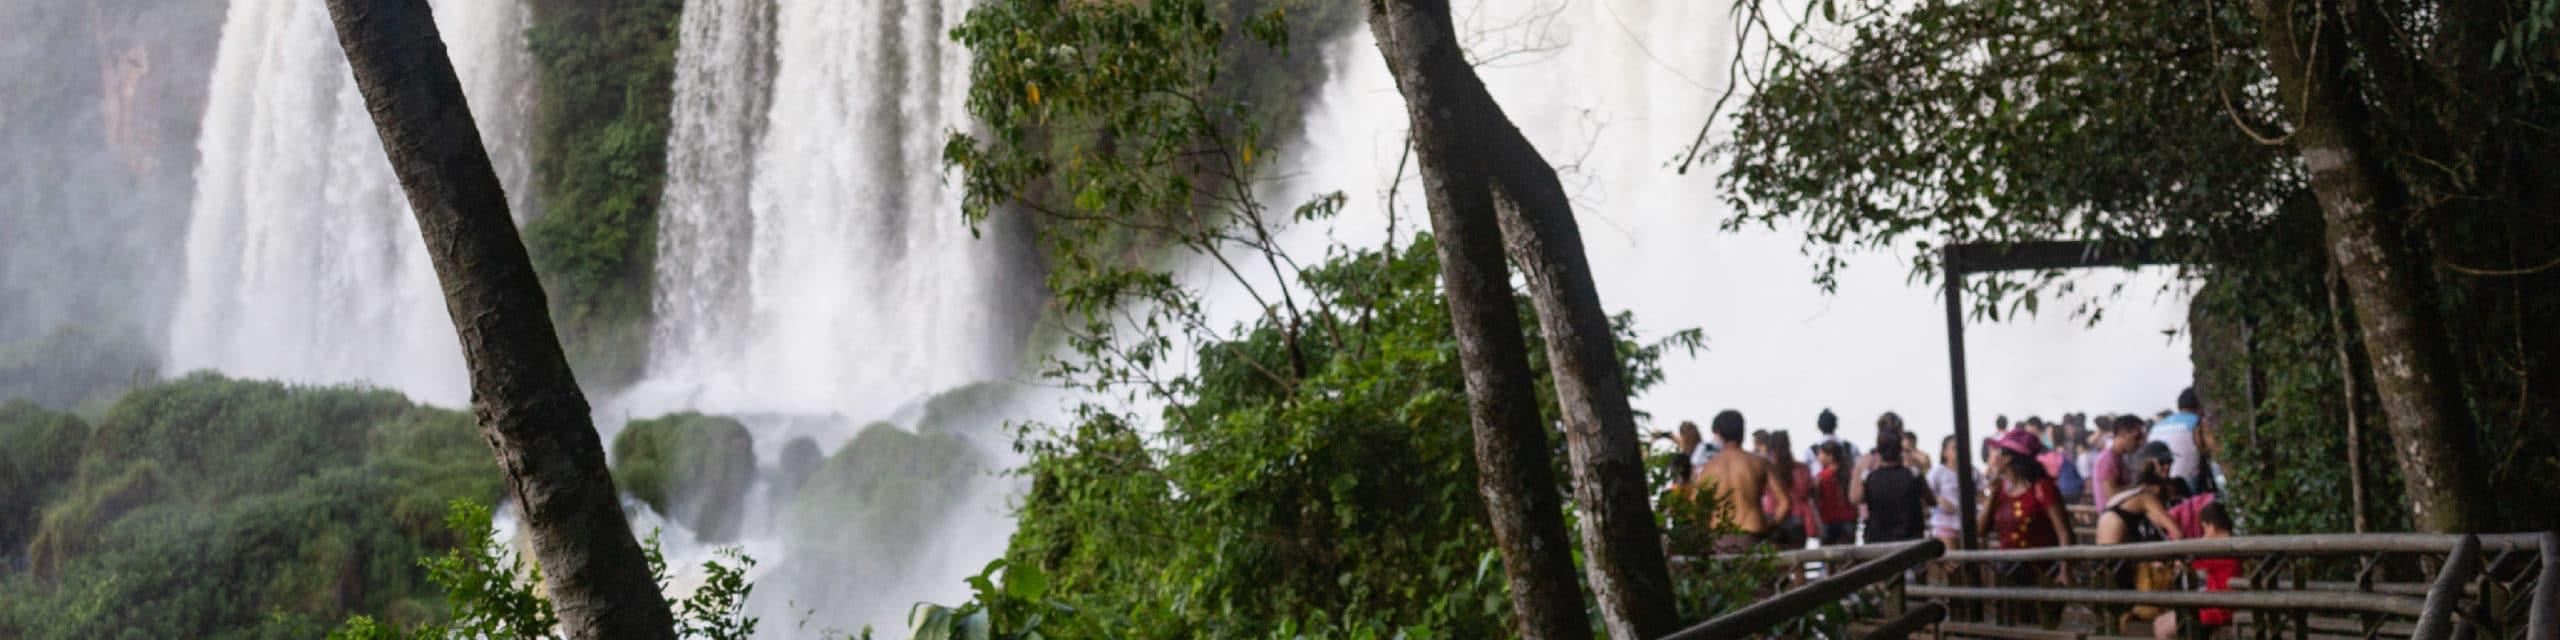 Iguazu Falls - Route of the Jesuits in Argentina